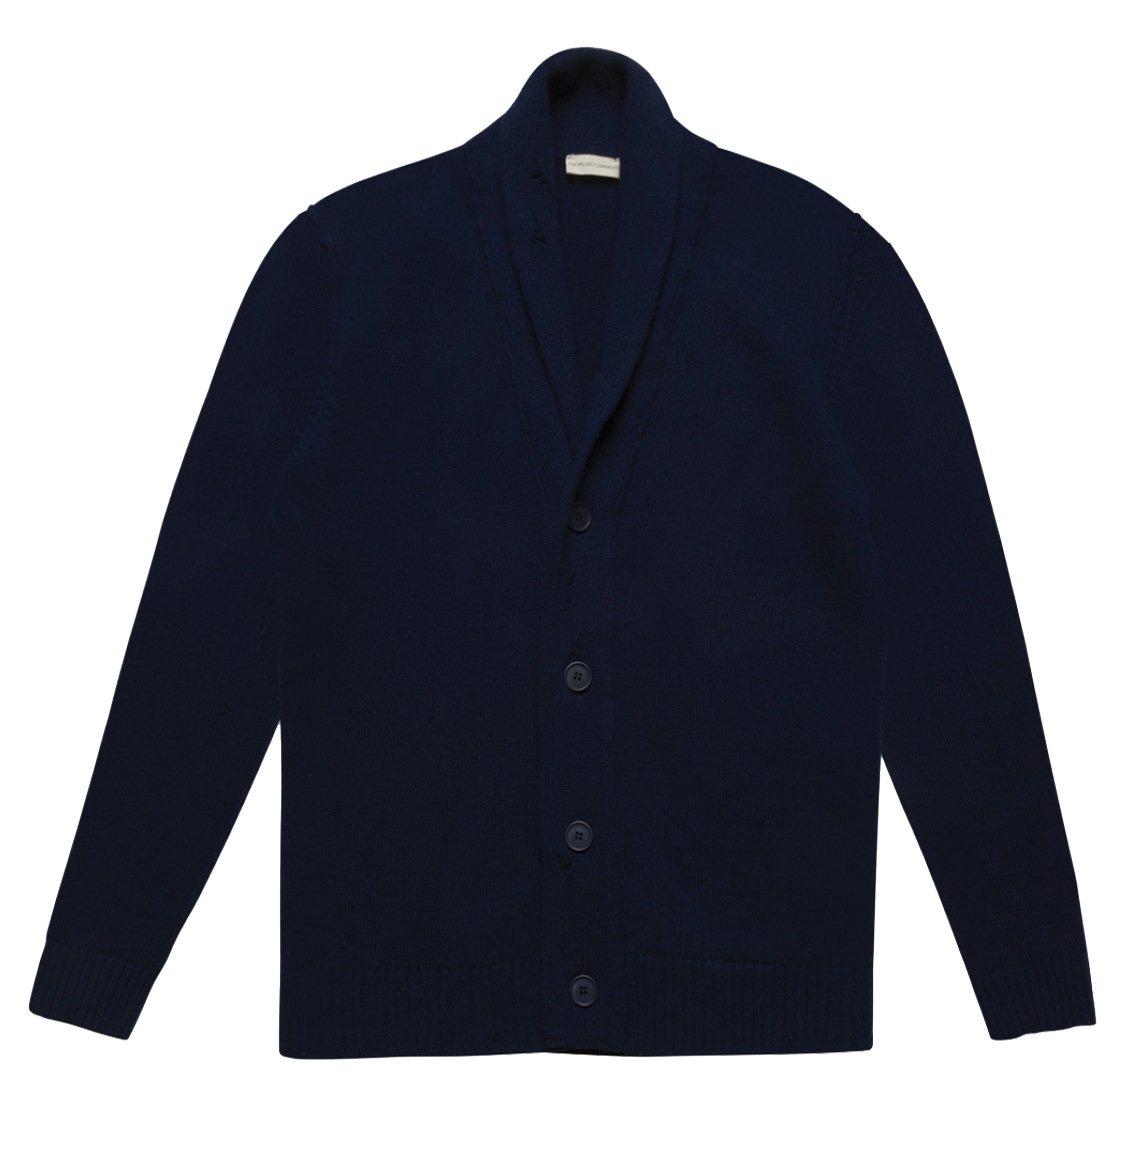 The Project Garments Shawl Collar Distressed Cardigan Virgin Wool Navy